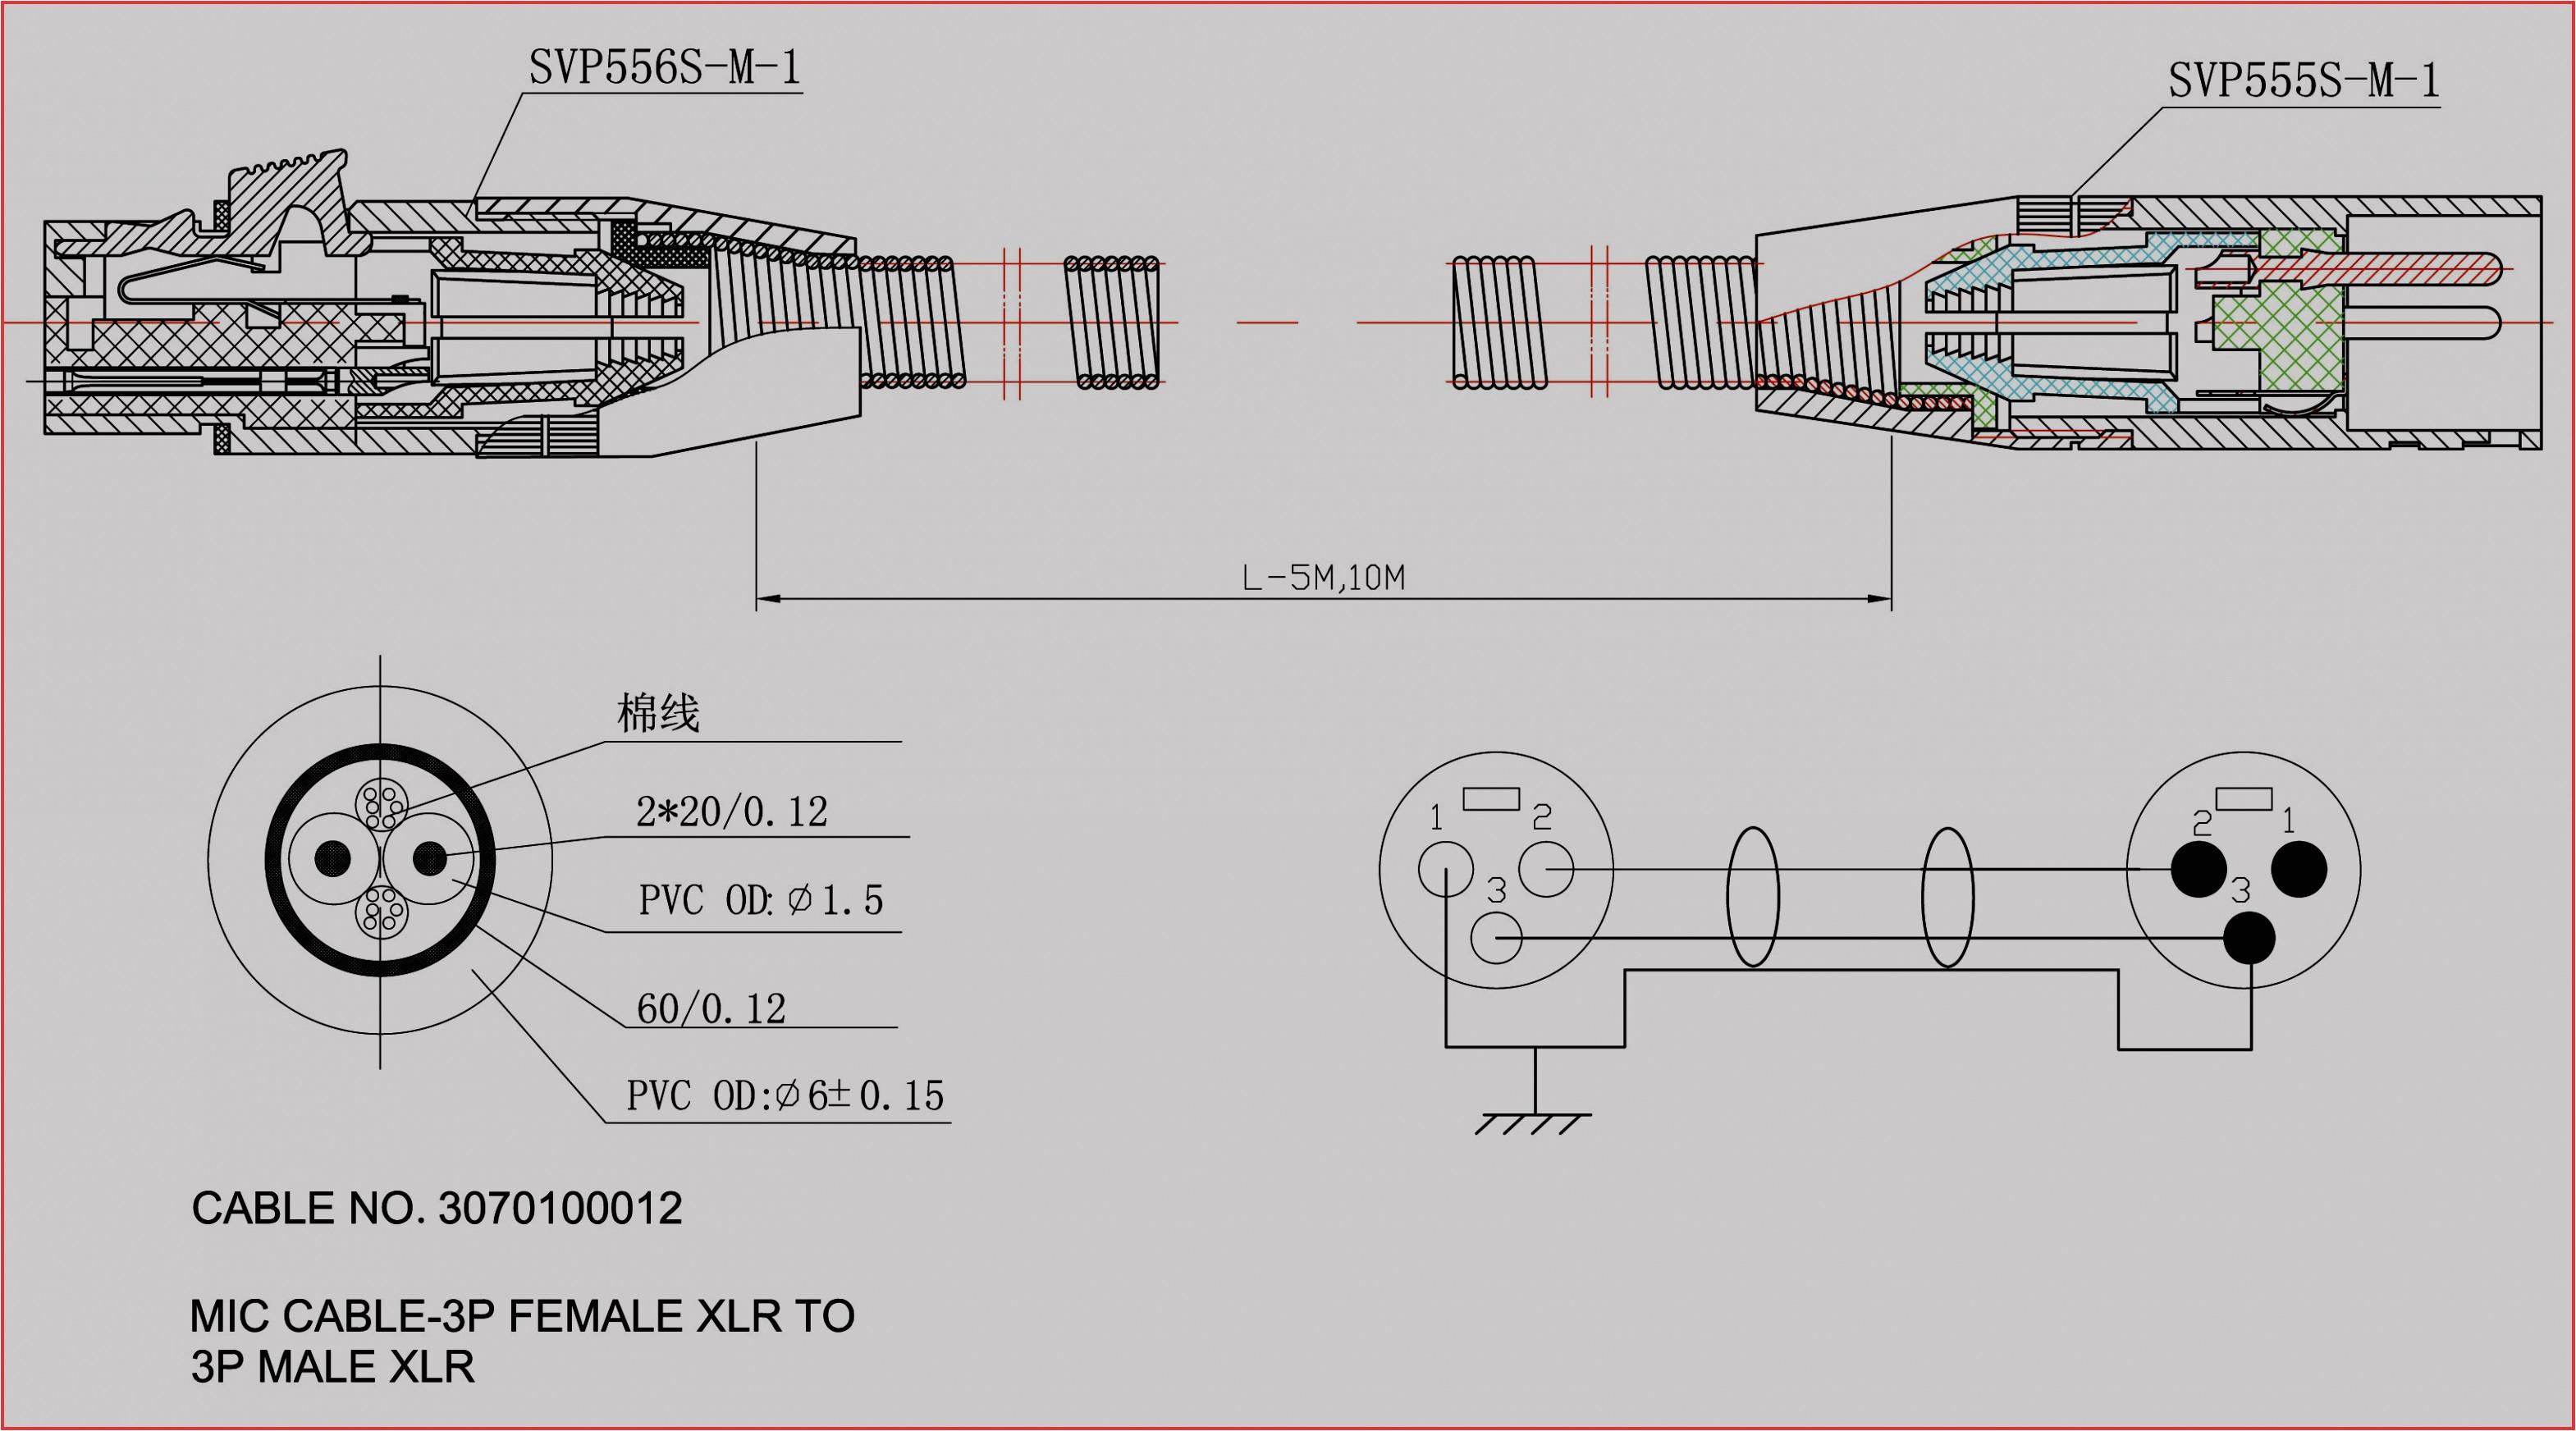 honda xr 125 wiring diagram 3 phase 208v wiring diagram euro schematics wiring diagrams